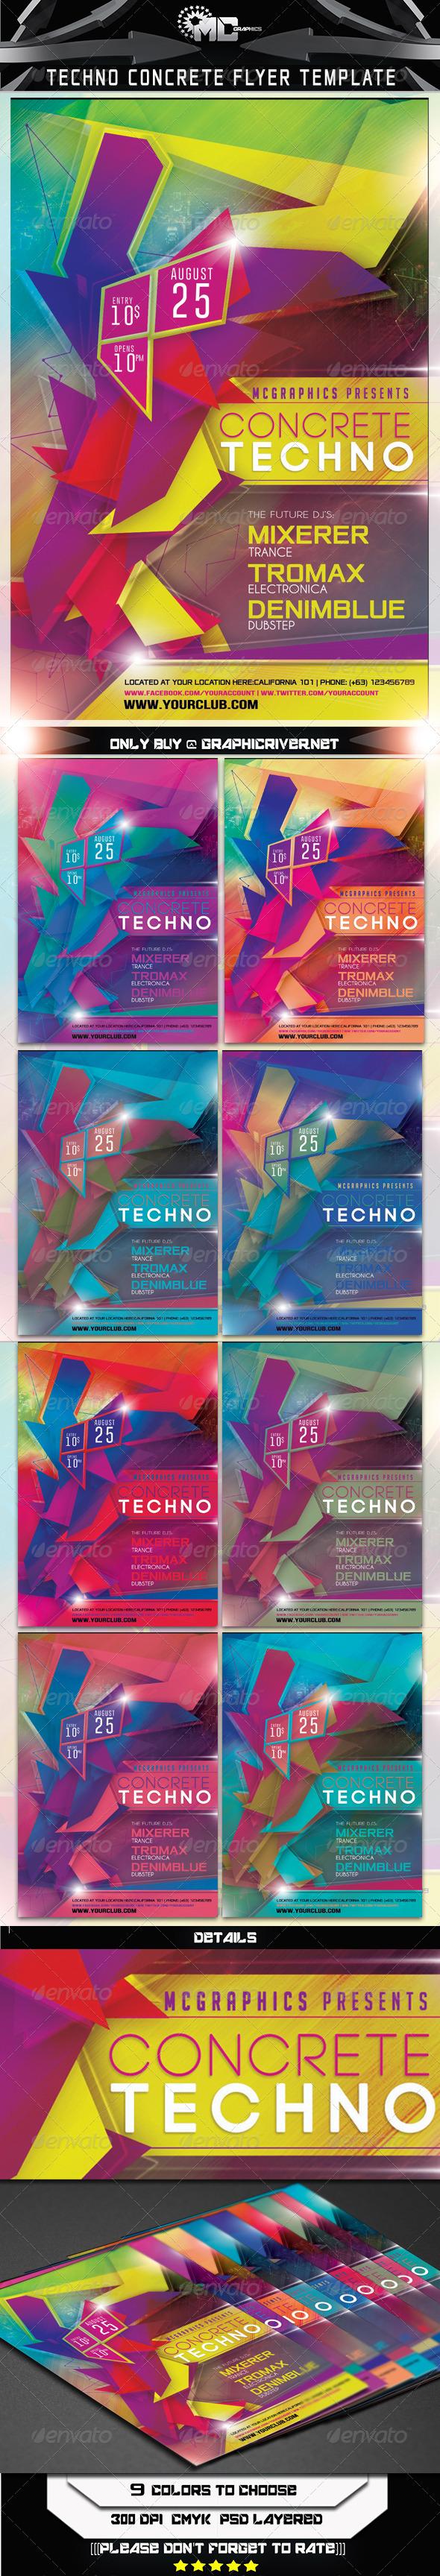 Techno Concrete Flyer Template - Clubs & Parties Events